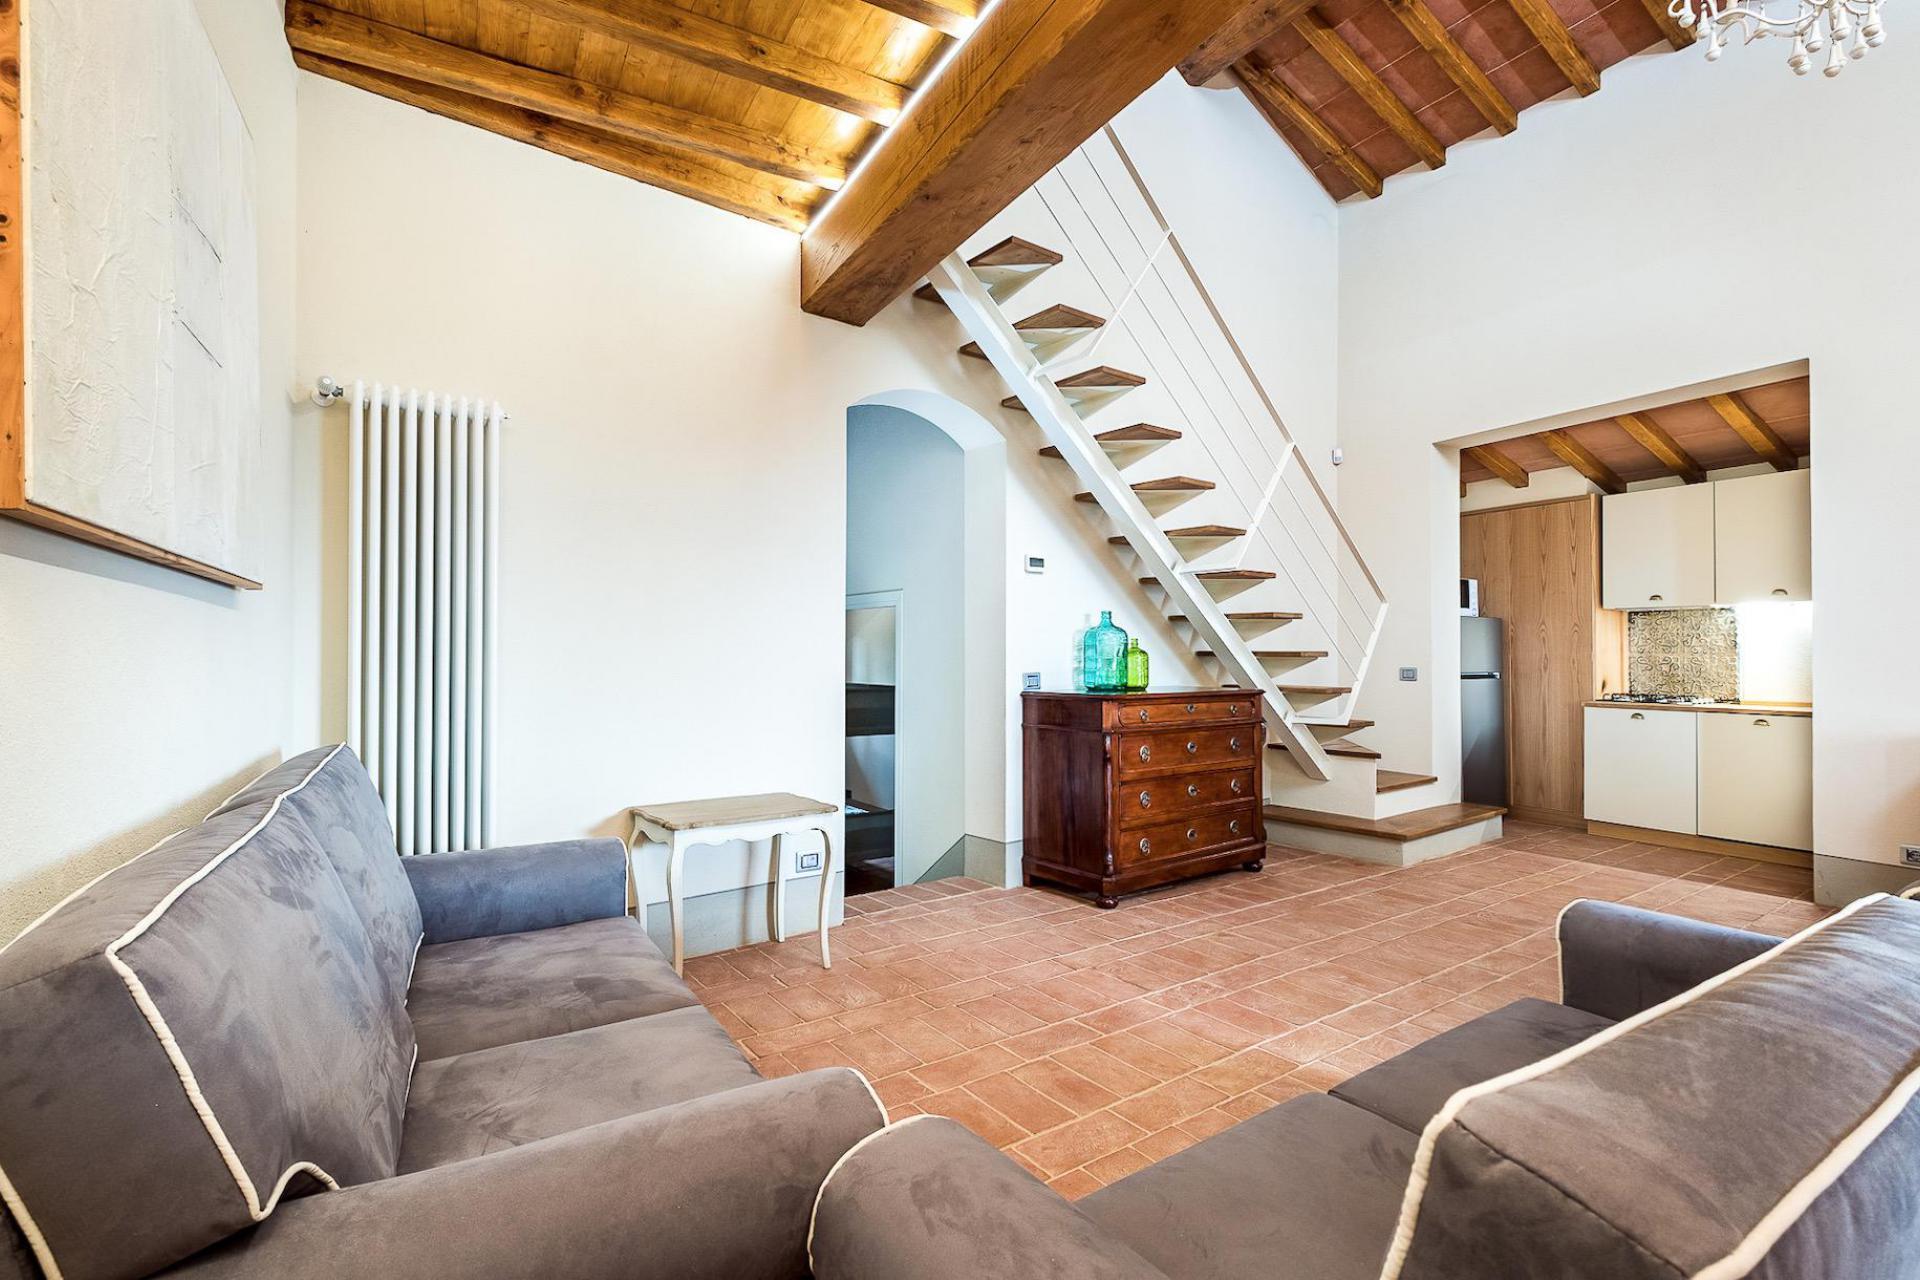 Agriturismo Toskana 11 Wohnungen mit Design-Interieur in der Toskana   myitalyselection.de